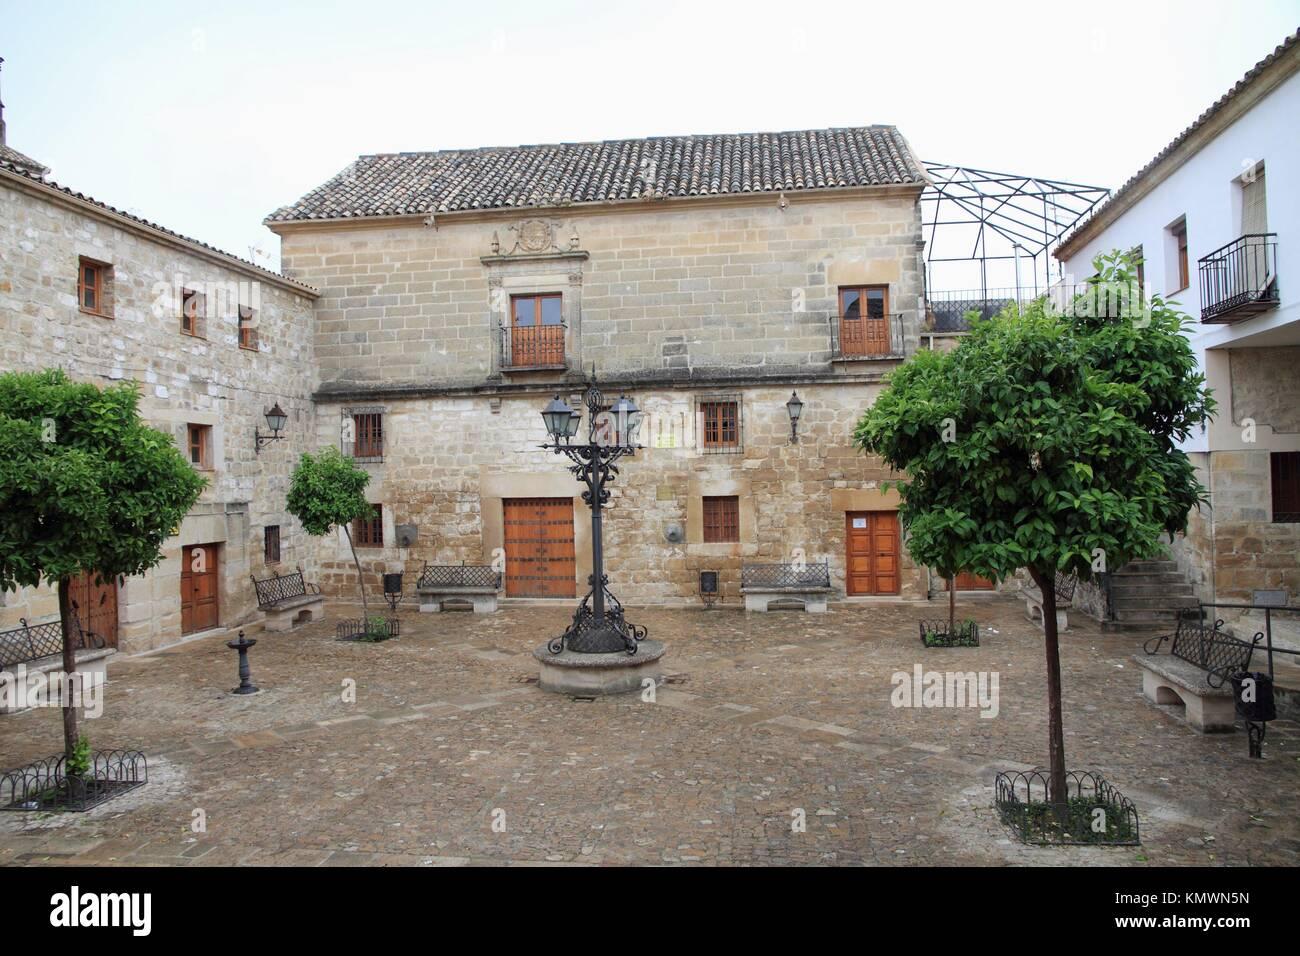 Street  Úbeda  Jaén province  Spain - Stock Image